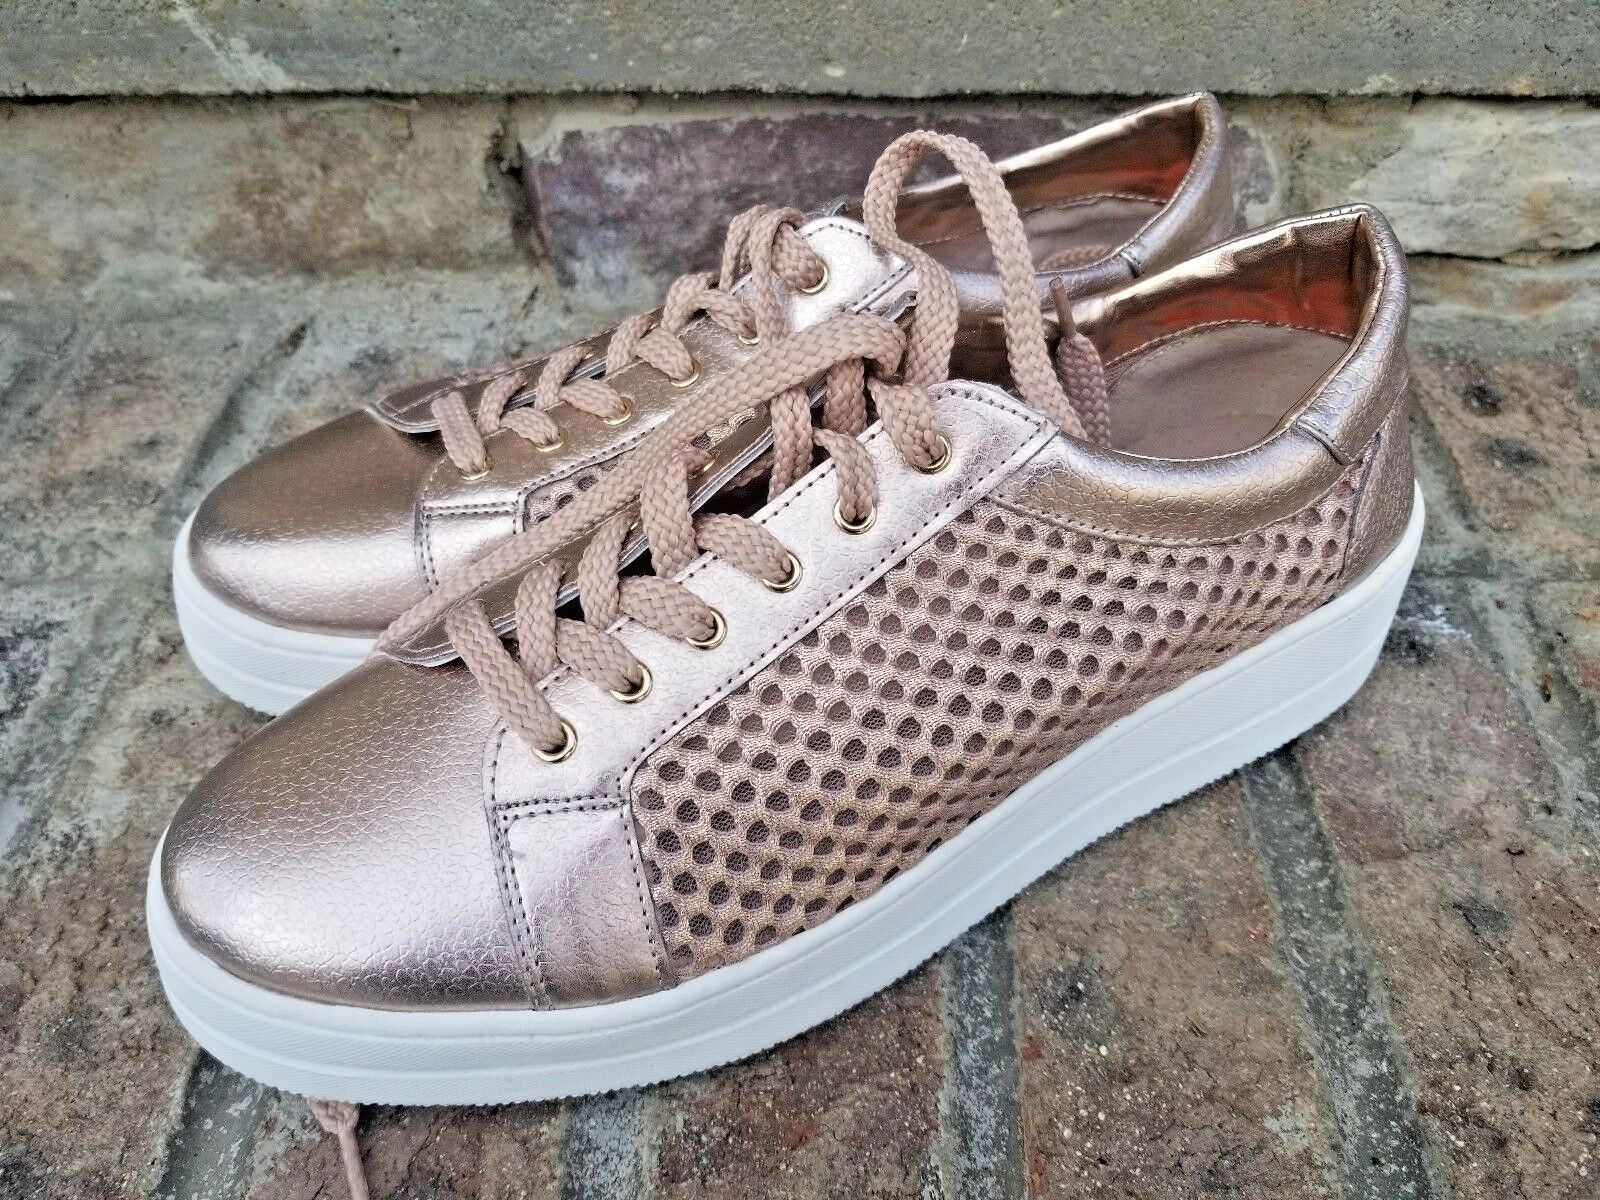 Steven Steve Madden Damenschuhe Nyssa Lace Up Rose Sneaker Schuhes Größe 9.5 Rose Up Gold Blush e66291